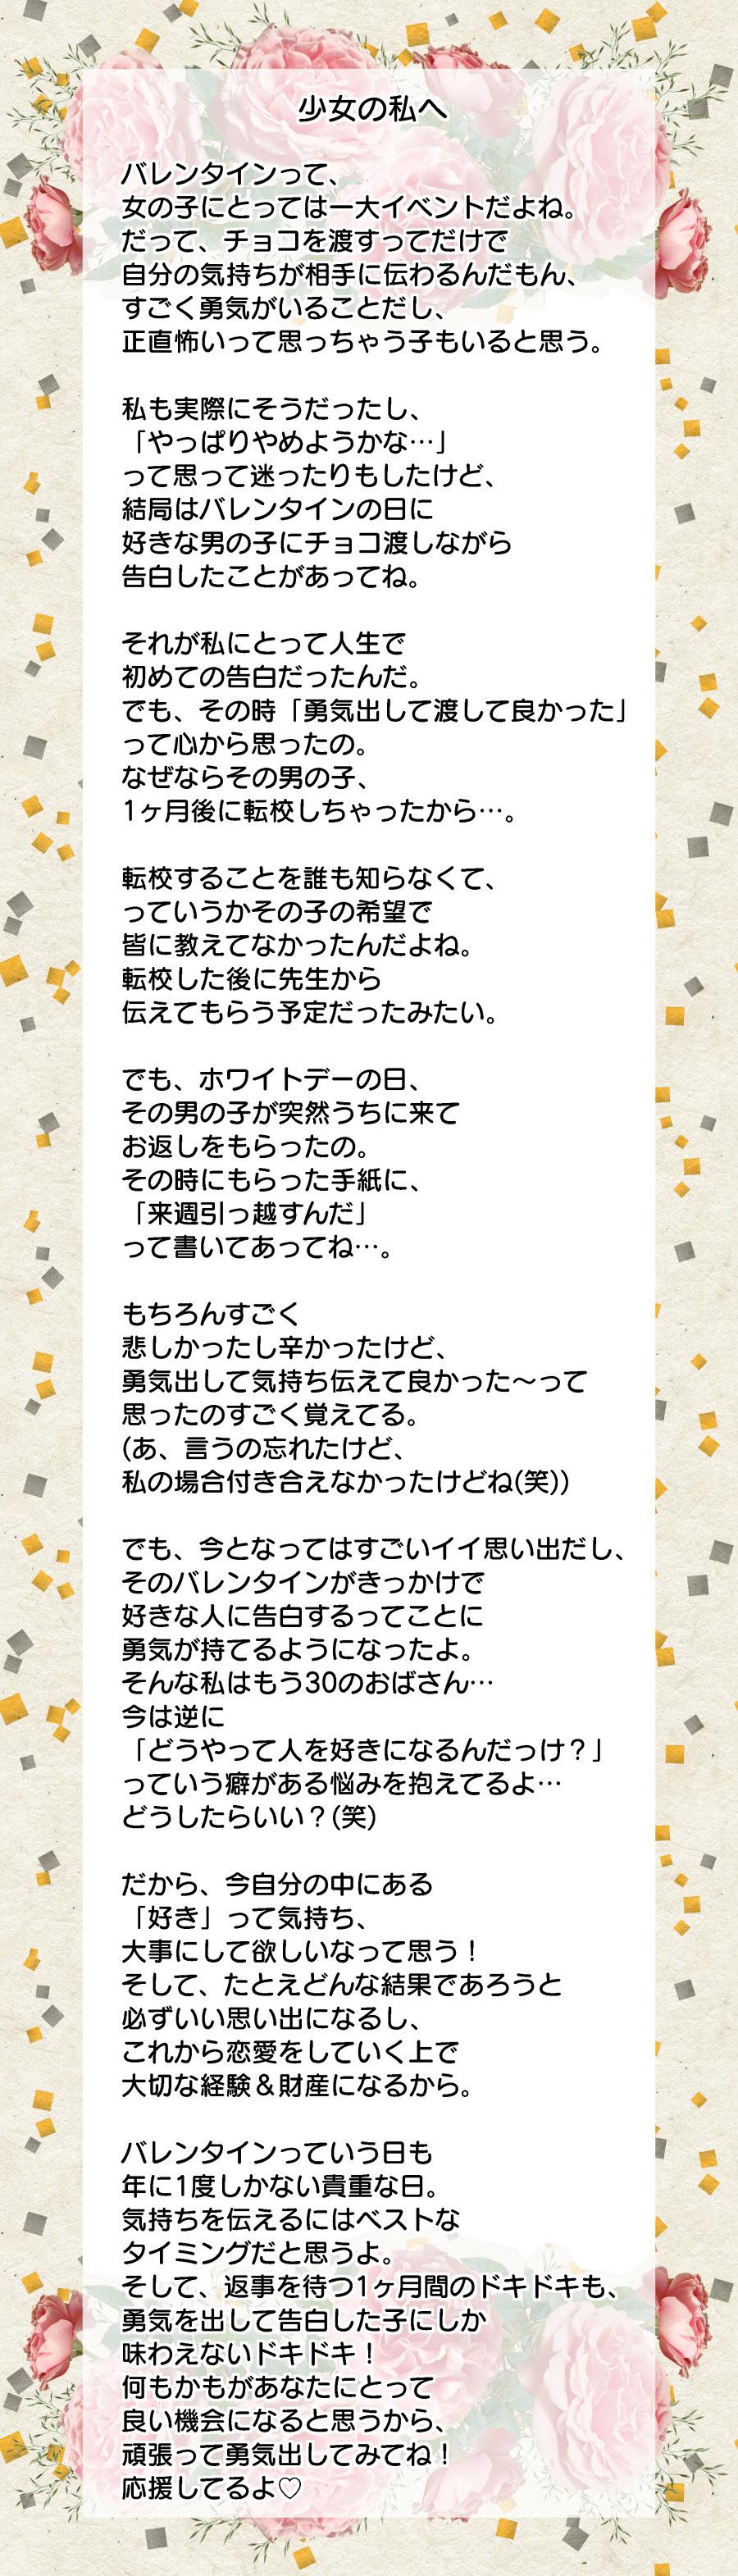 20210204手紙②